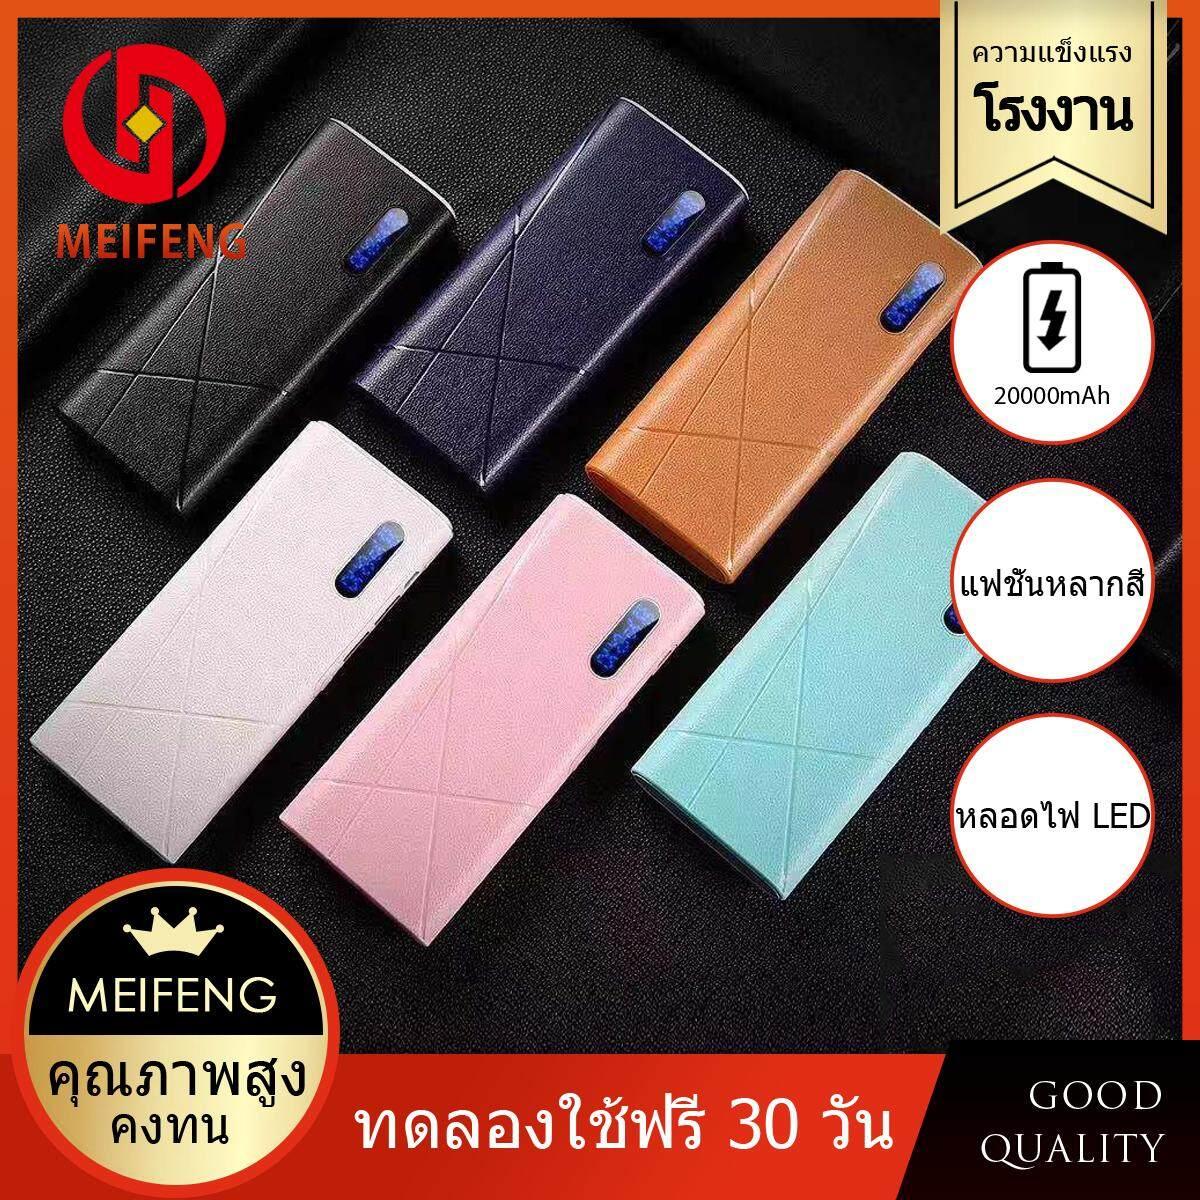 Meifeng Mkl05 Power Bank พลังงานมือถือ 20000 Mah แบตเตอรี่สำรองแบบ ความจุขนาดใหญ่ พกพาสำหรับ Apple, Huawei, ข้าวฟ่าง, Vivo, Oppo ชาร์จเร็ว2.1a (พลังงานมือถือ, พลังงานแบตเตอรี่สำรอง), ฟรี Micro Usb สายชาร์จ (ตามมาตรฐานมอก)รับประกัน 1 ปี.